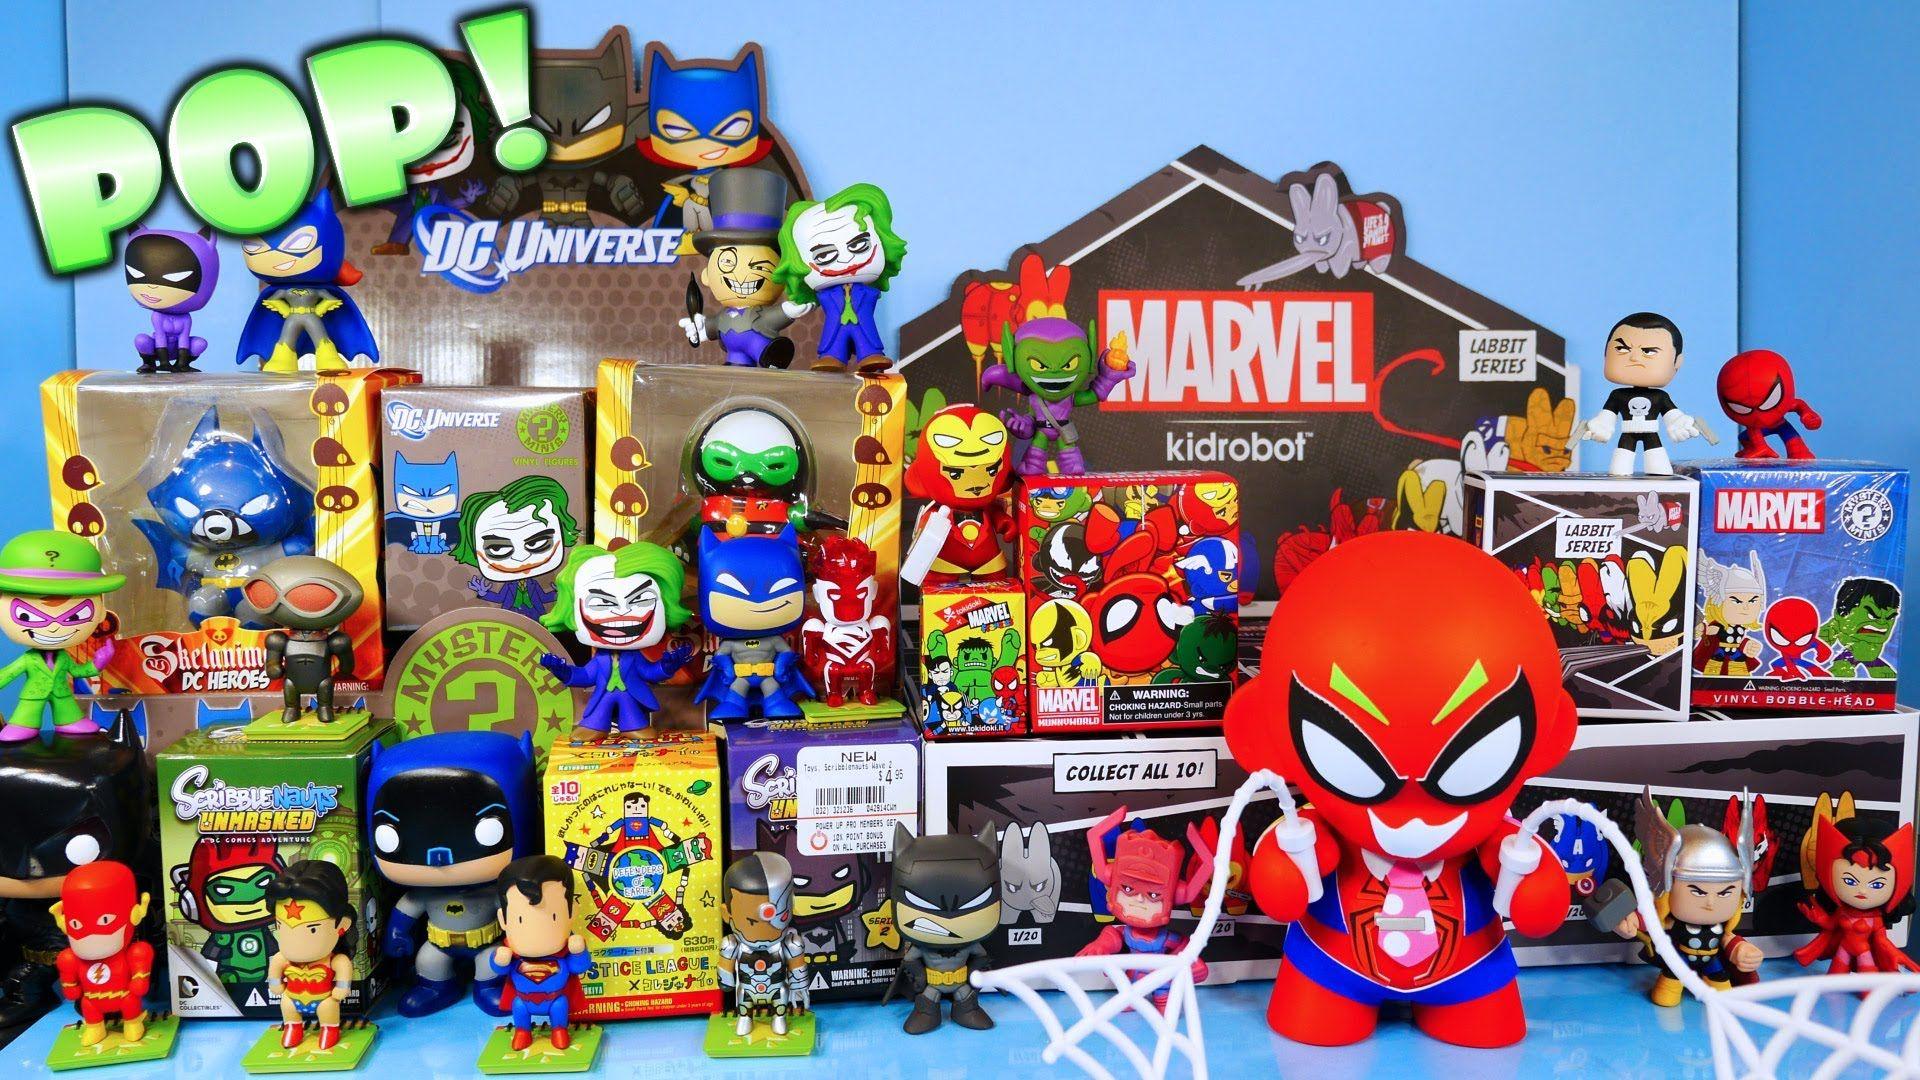 B toys cars  DC Vs Marvel Superhero Toys Showdown Super Blind Box Unboxing